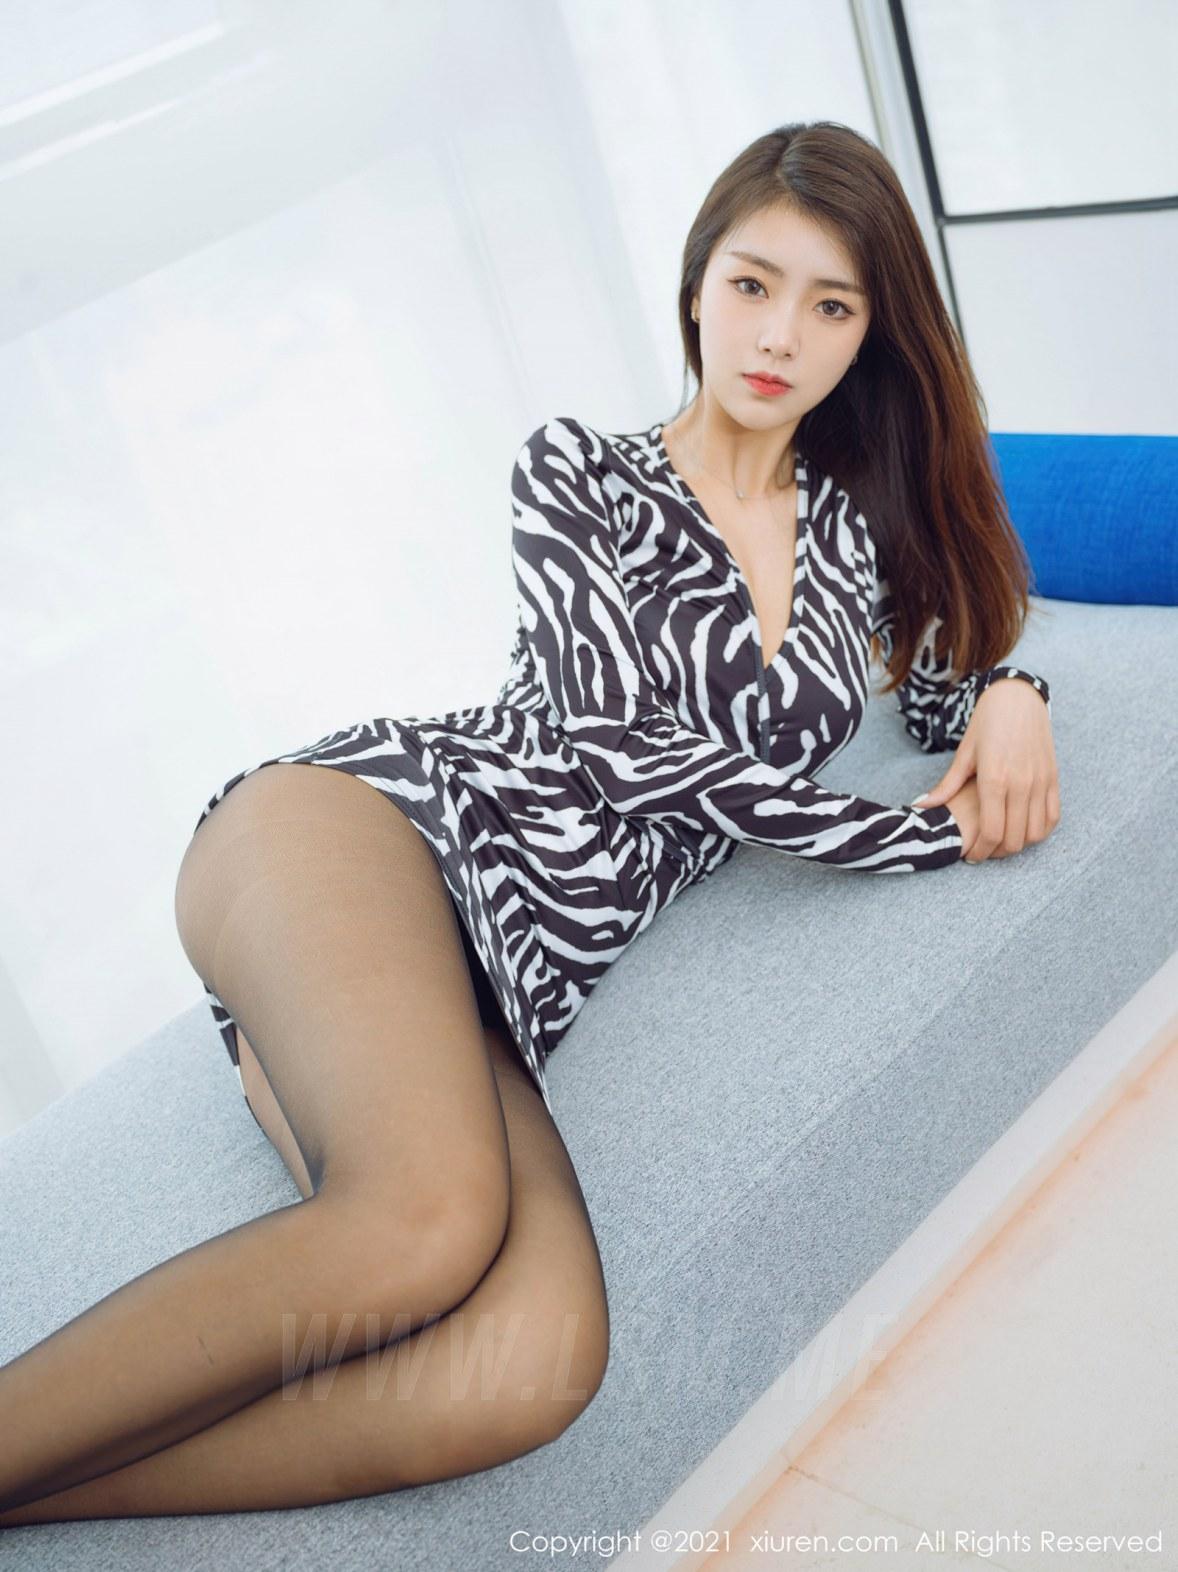 3890 045 adi 4047 5400 - XiuRen 秀人 No.3890 斑纹短裙 可樂Vicky 性感写真2 - 秀人网 -【免费在线写真】【丽人丝语】